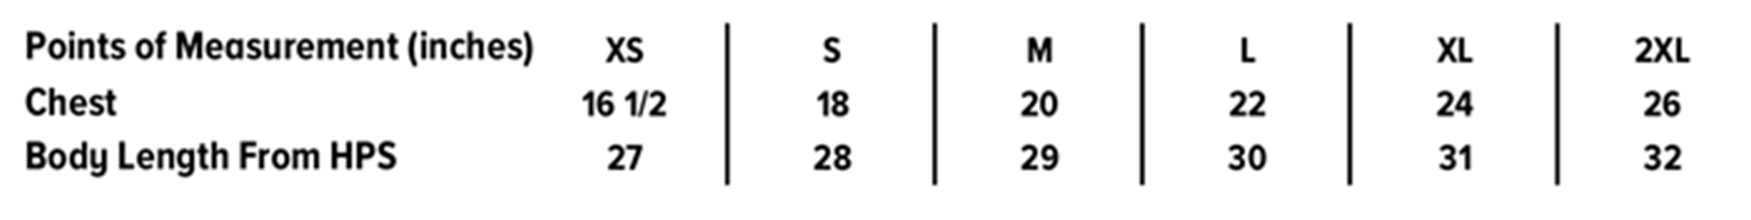 shirt-measurements3-1579205137-68ef9.jpg